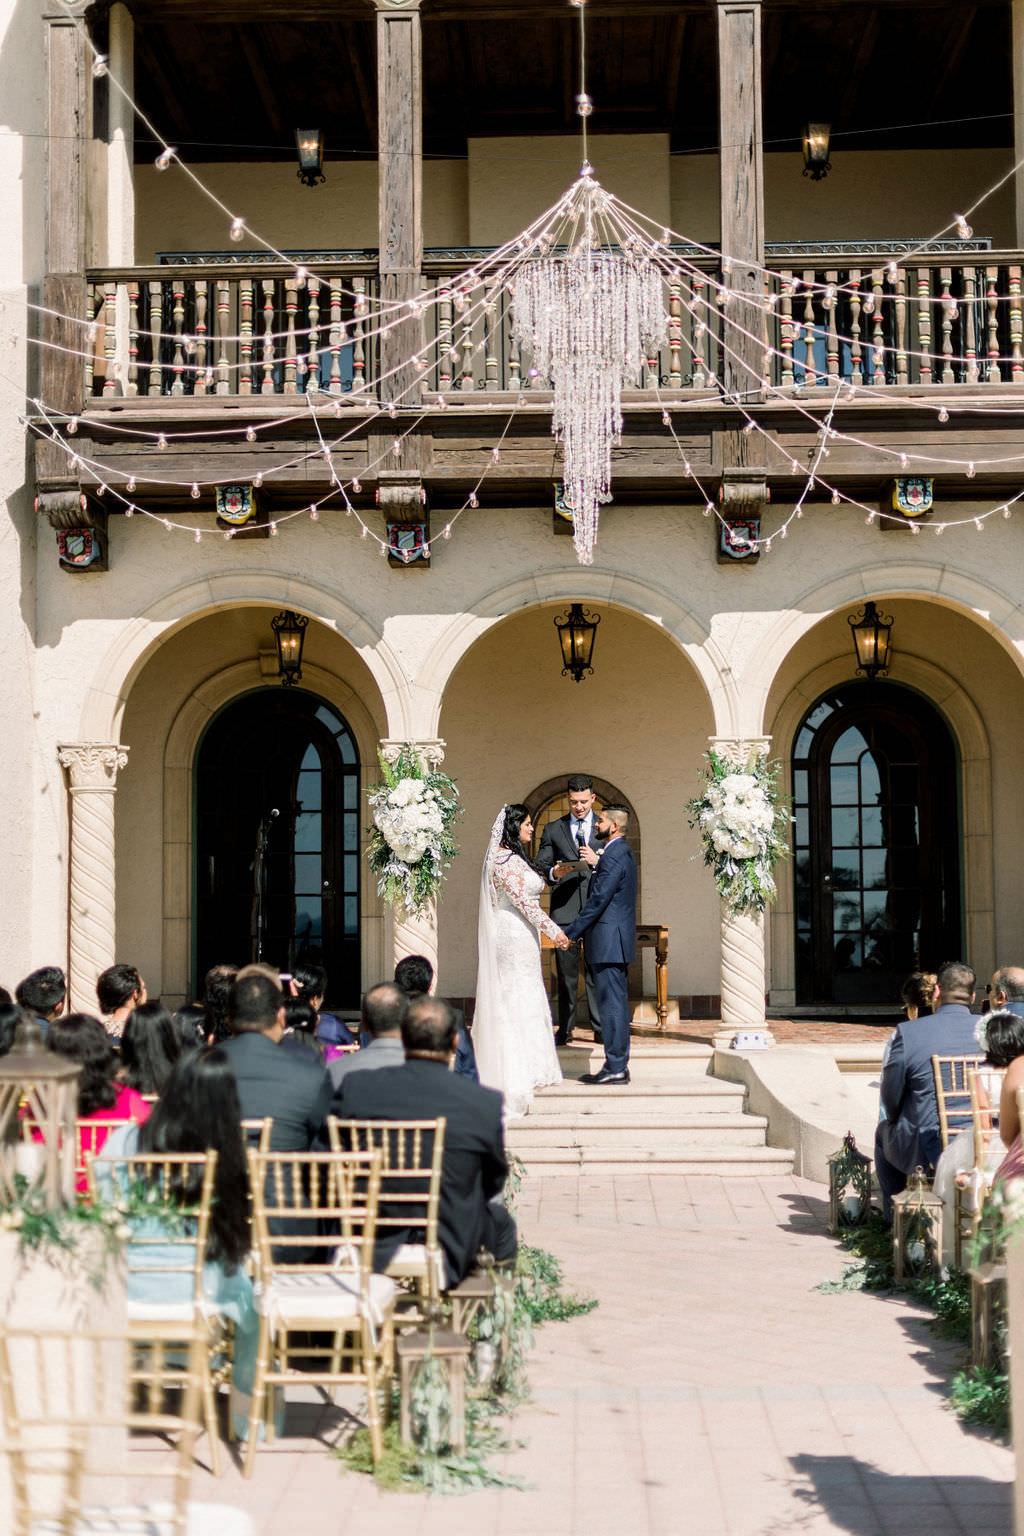 Elegant Powel Crosley Estate Wedding Ceremony, Outdoor Chandelier with String Lighting, Sarasota Wedding Planer Laura Detwiler Events